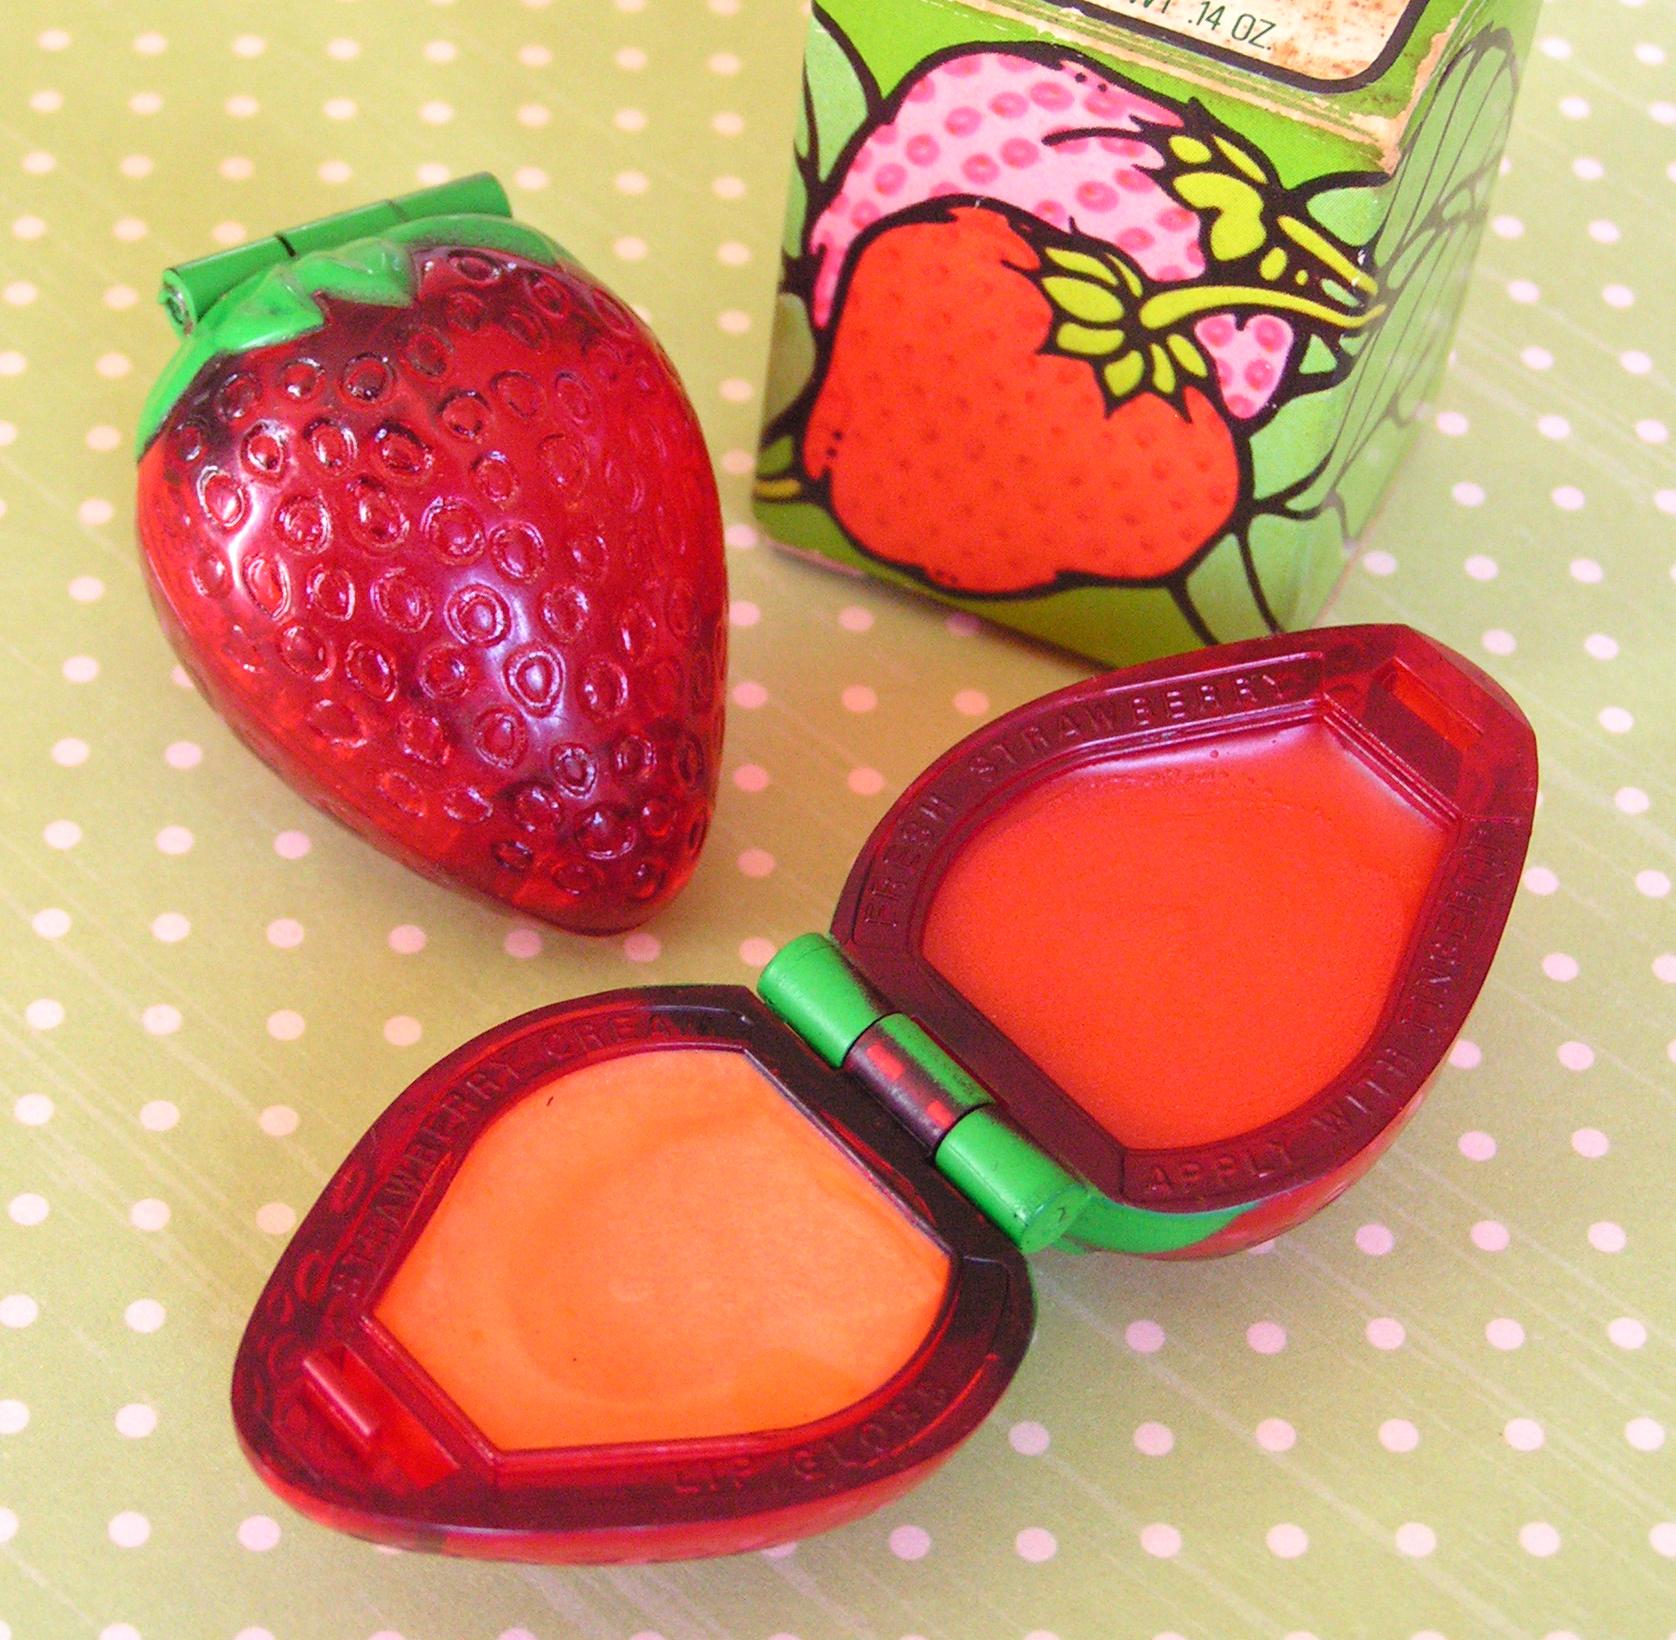 http://velvetstrawberries.typepad.com/.a/6a00d8341c8f0053ef01157008958f970b-pi